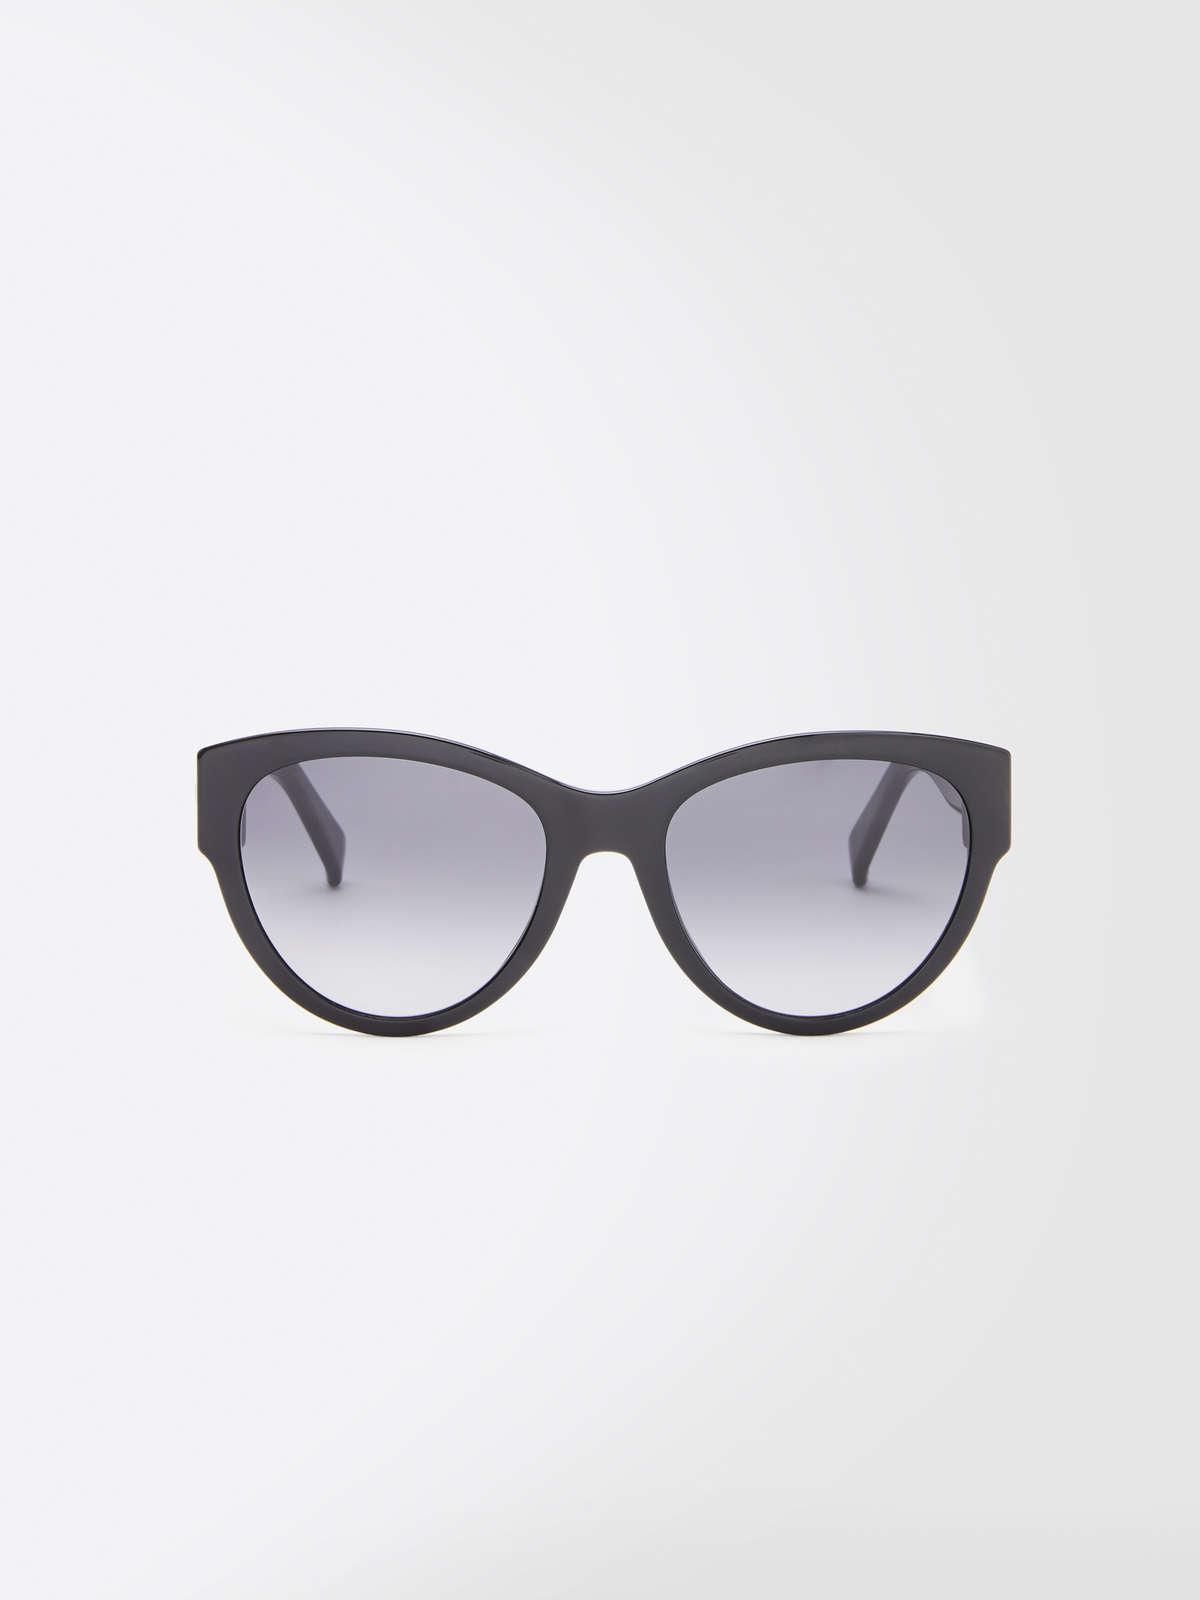 Max Mara - Cat-Eye-Sonnebrille - 5